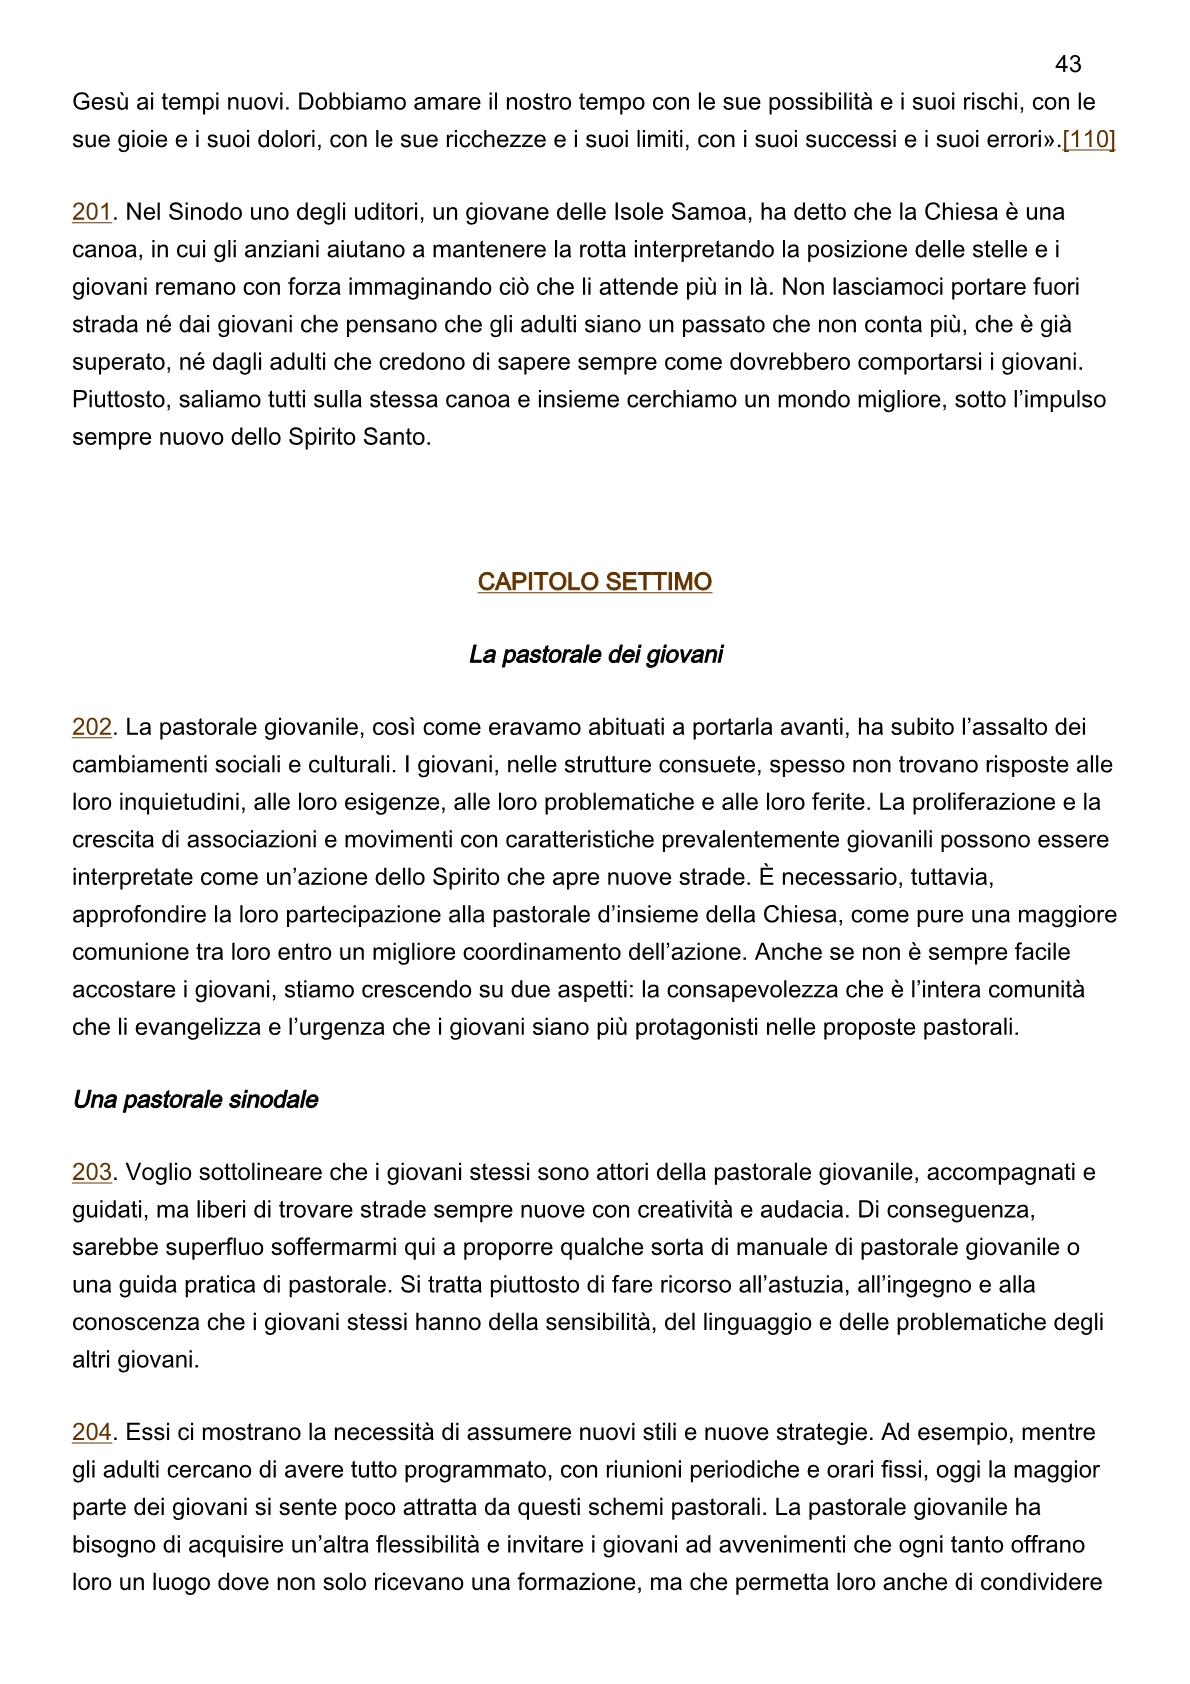 papa-francesco_esortazione-ap_20190325_christus-vivit43